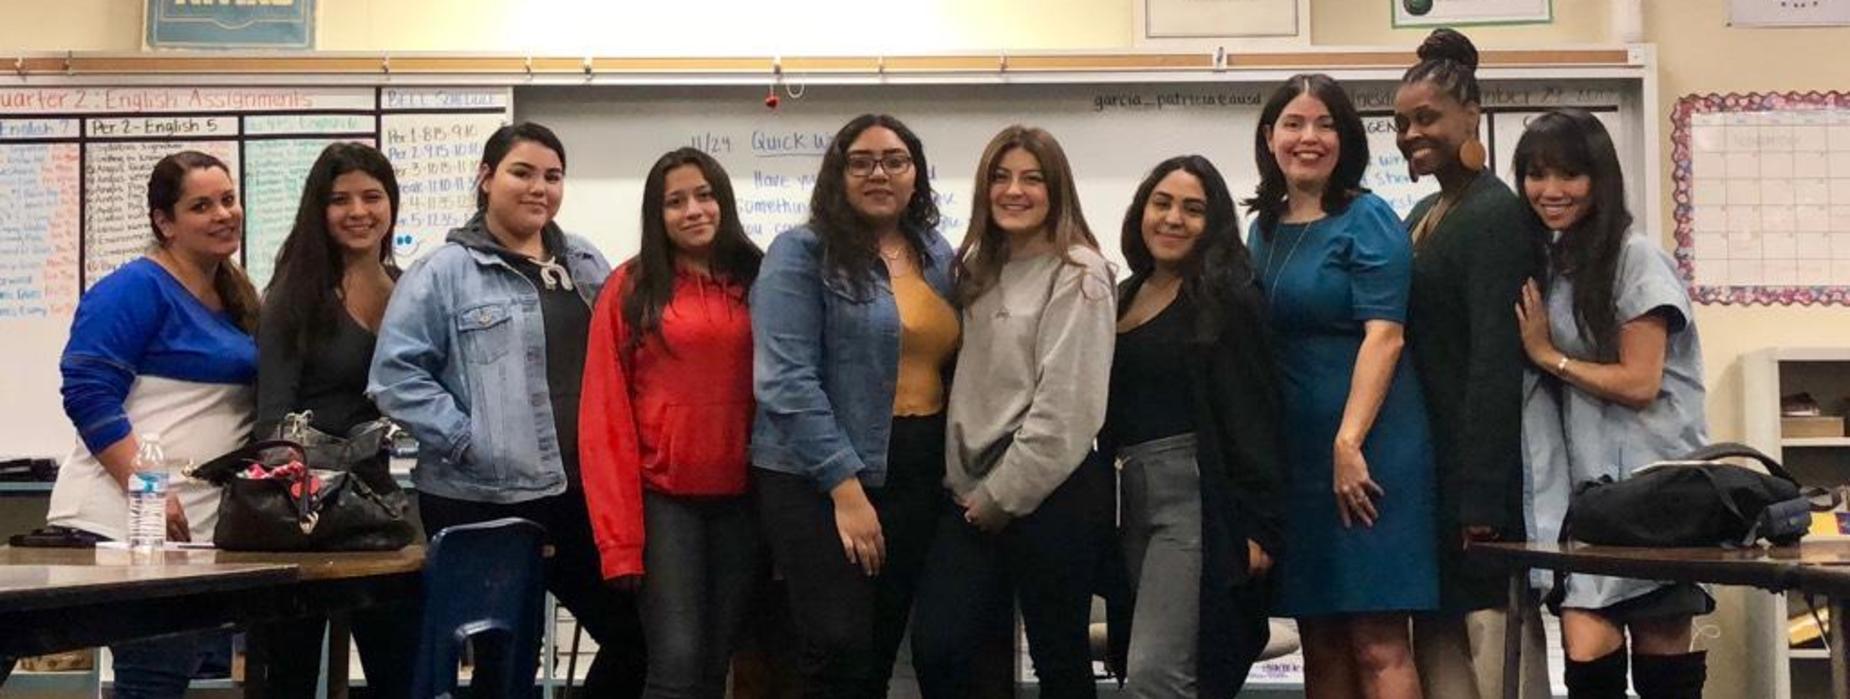 Group photo at CHS